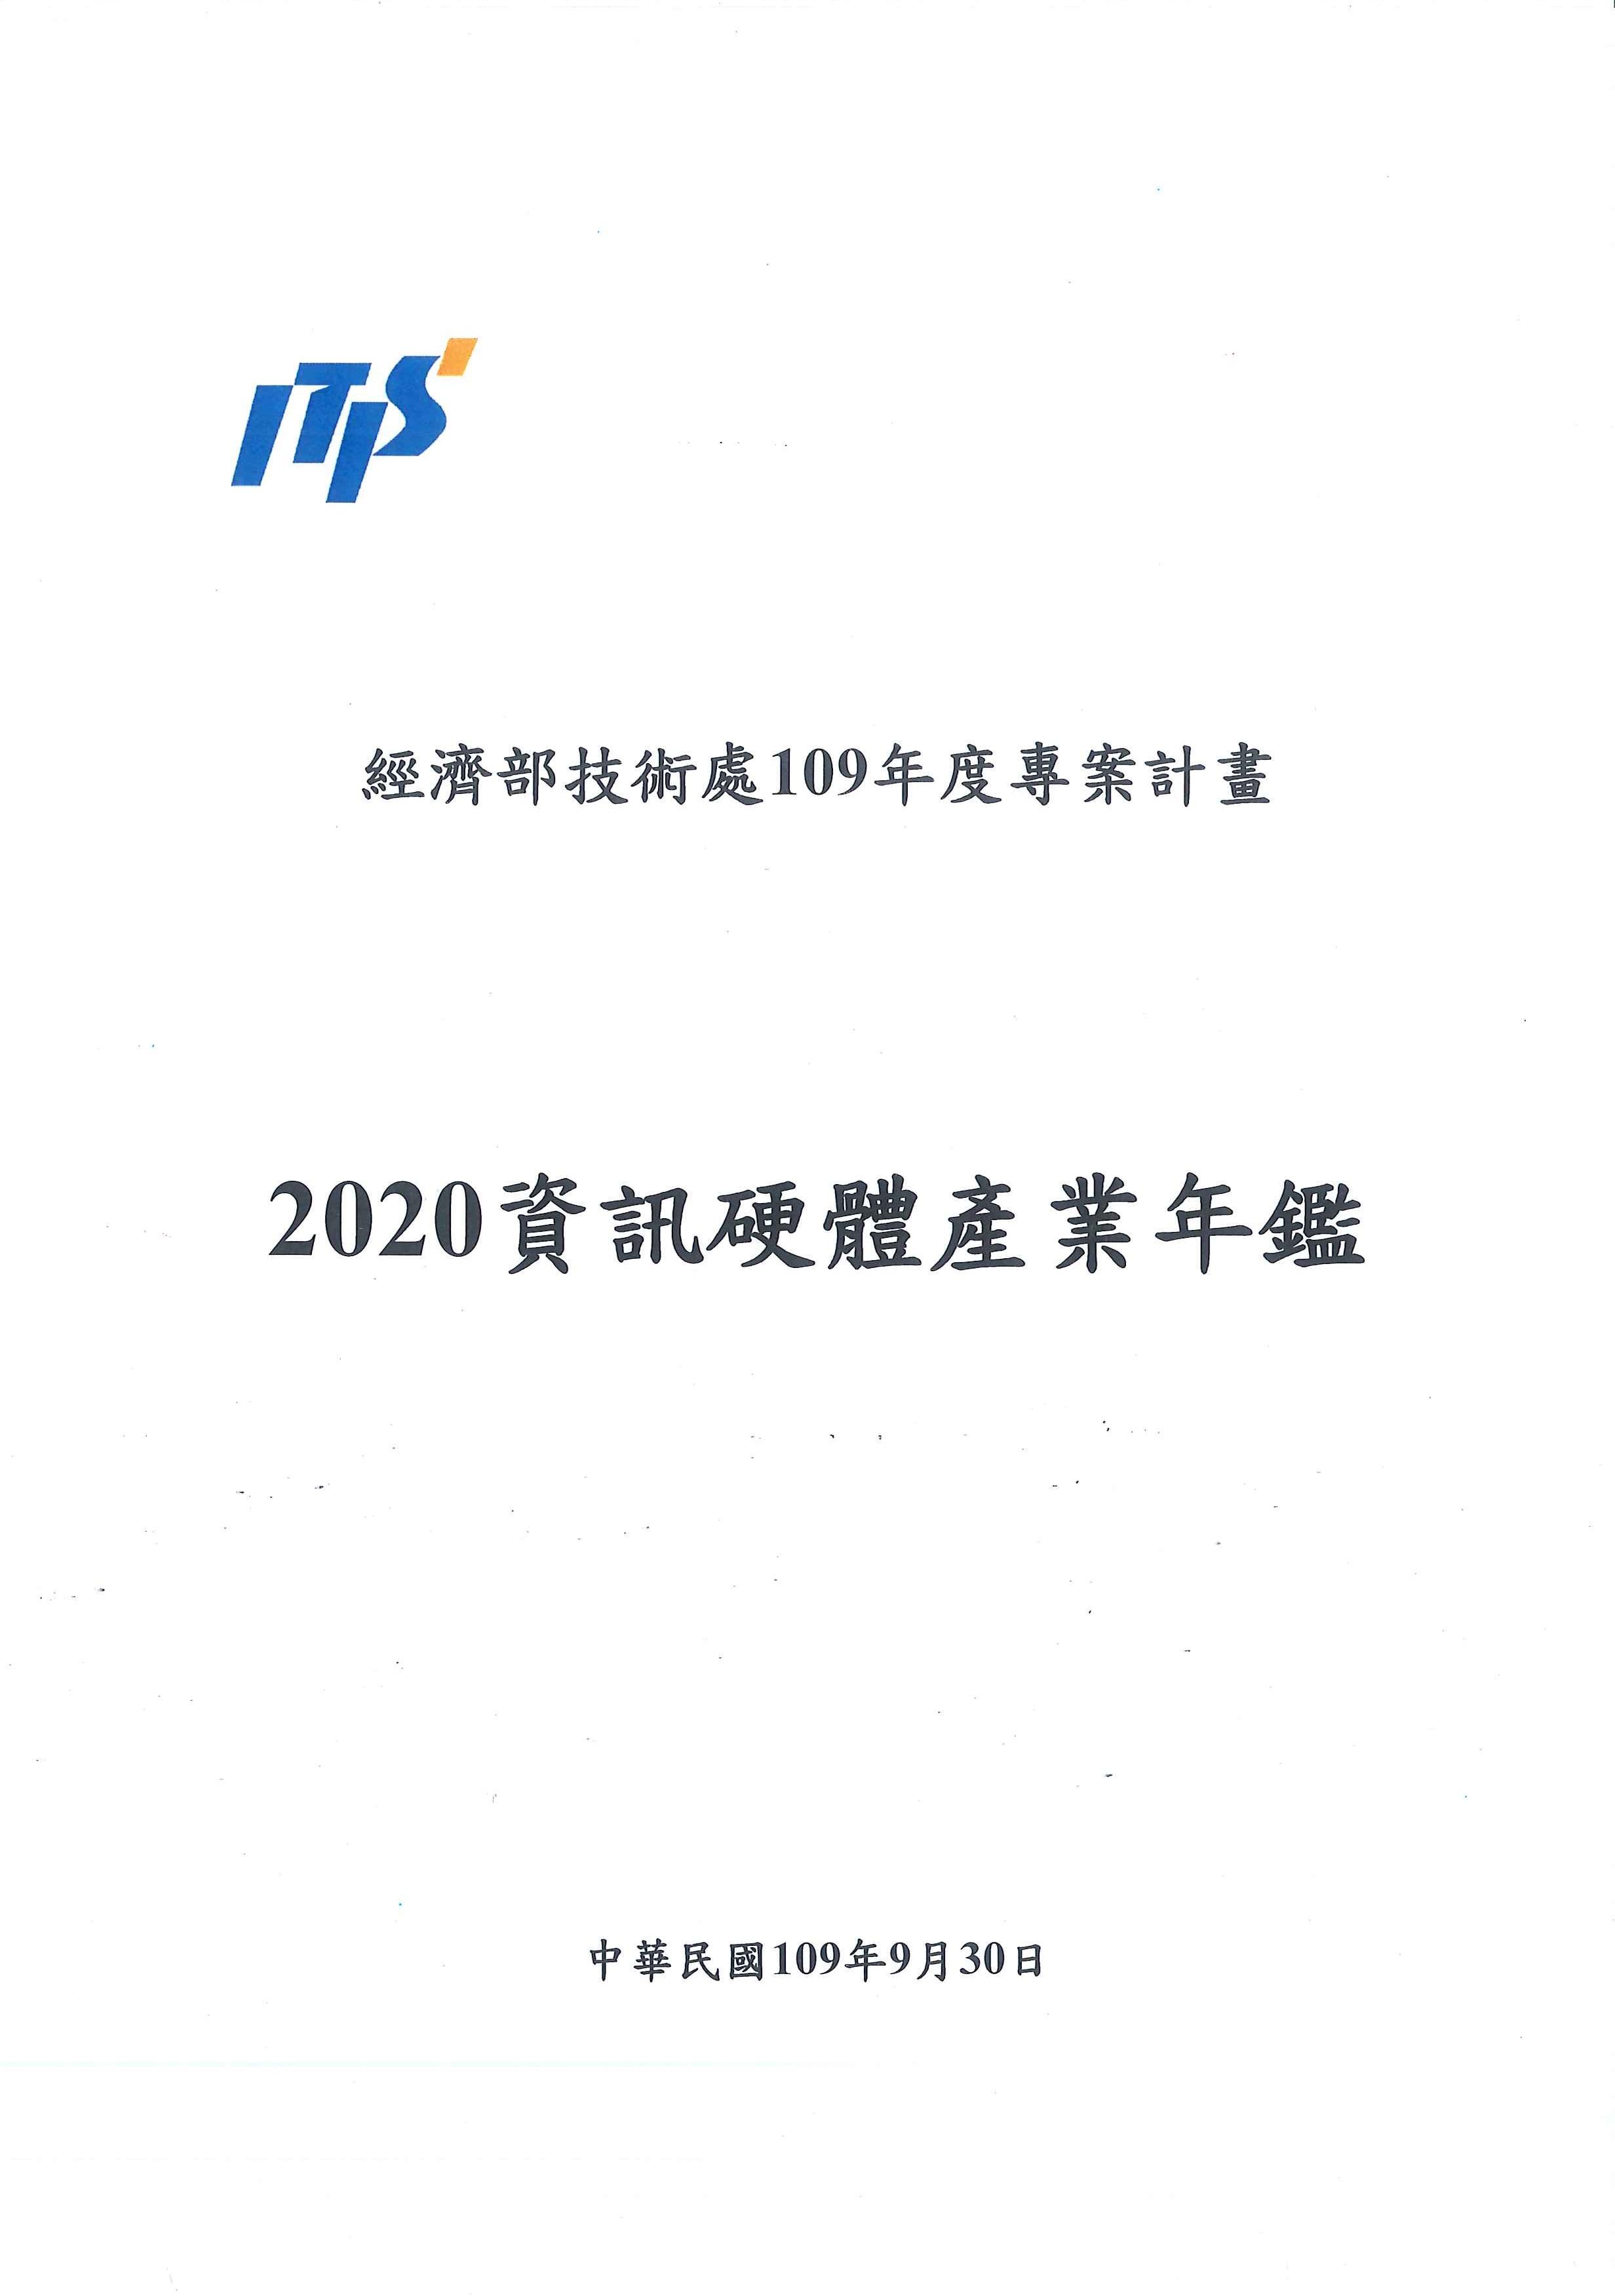 資訊硬體產業年鑑 [電子書]=Information industry yearbook